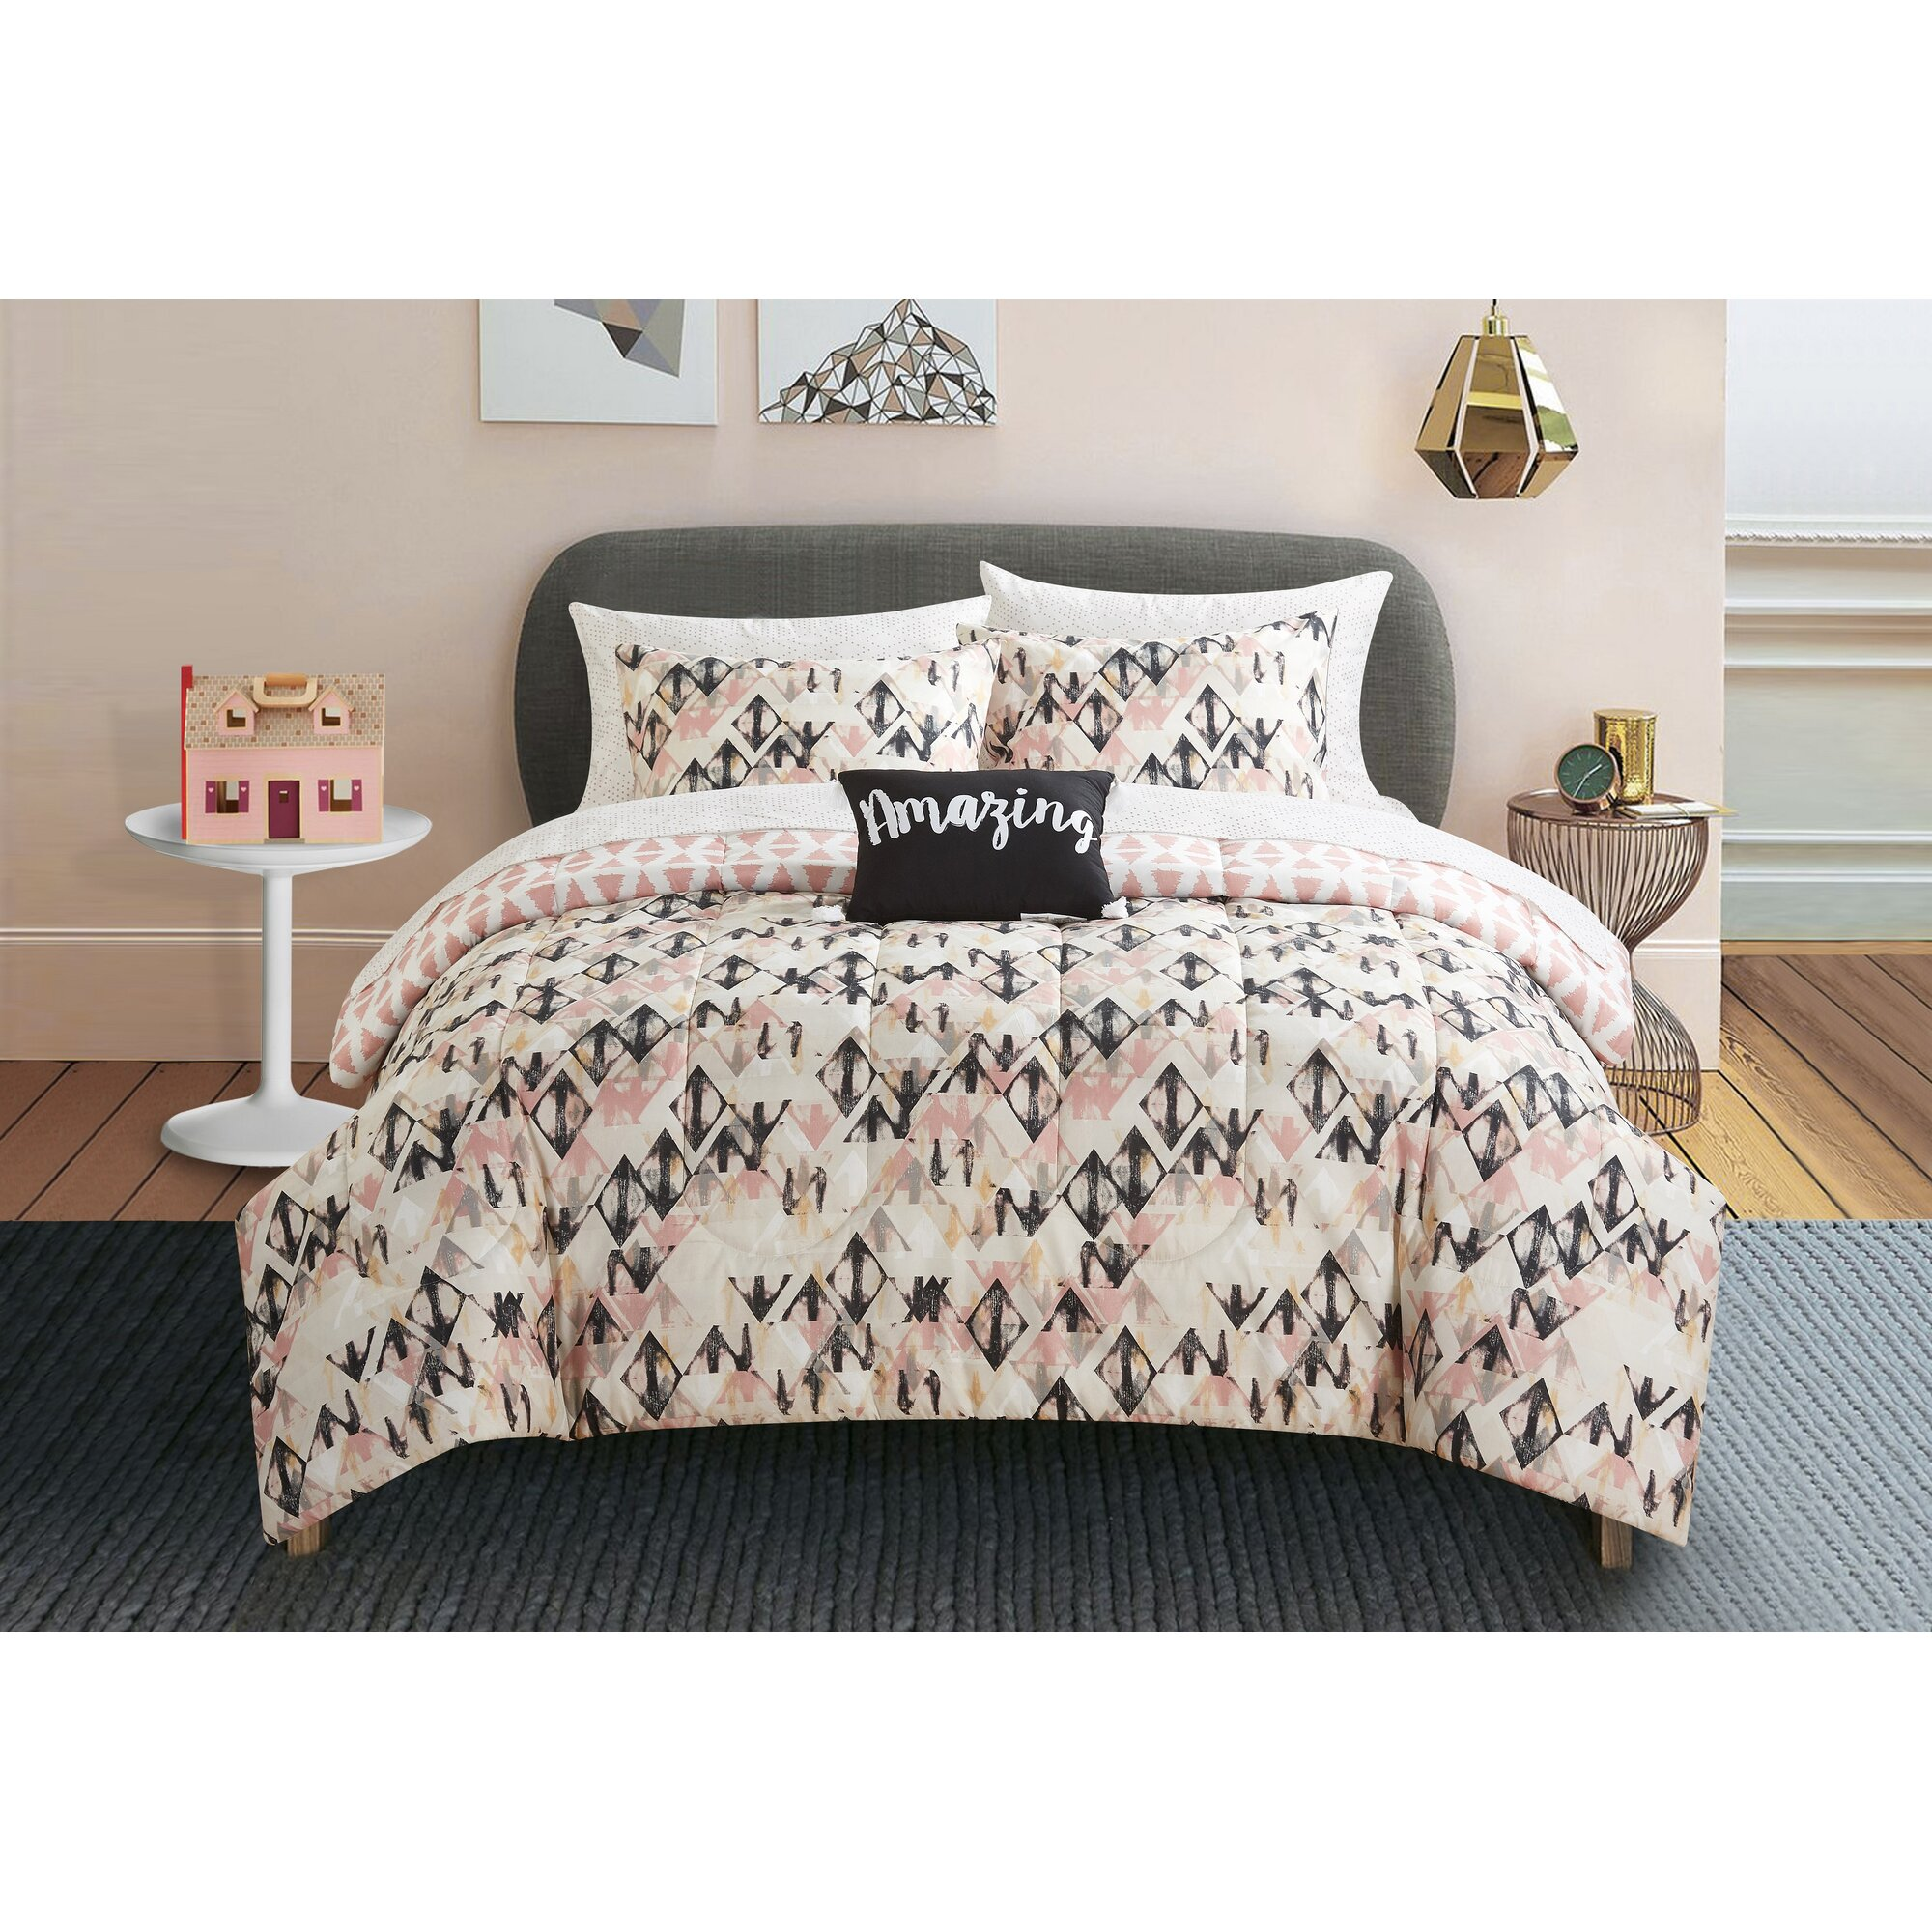 us white bed unikko red com sheet bedding set mini en marimekko king